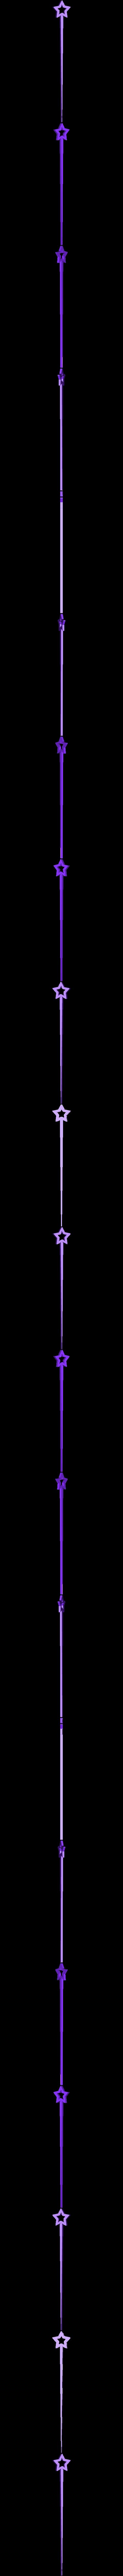 star_pick_long_3dprintny.stl Download free STL file Holiday Party Picks and Swizzle Sticks • 3D print model, barb_3dprintny